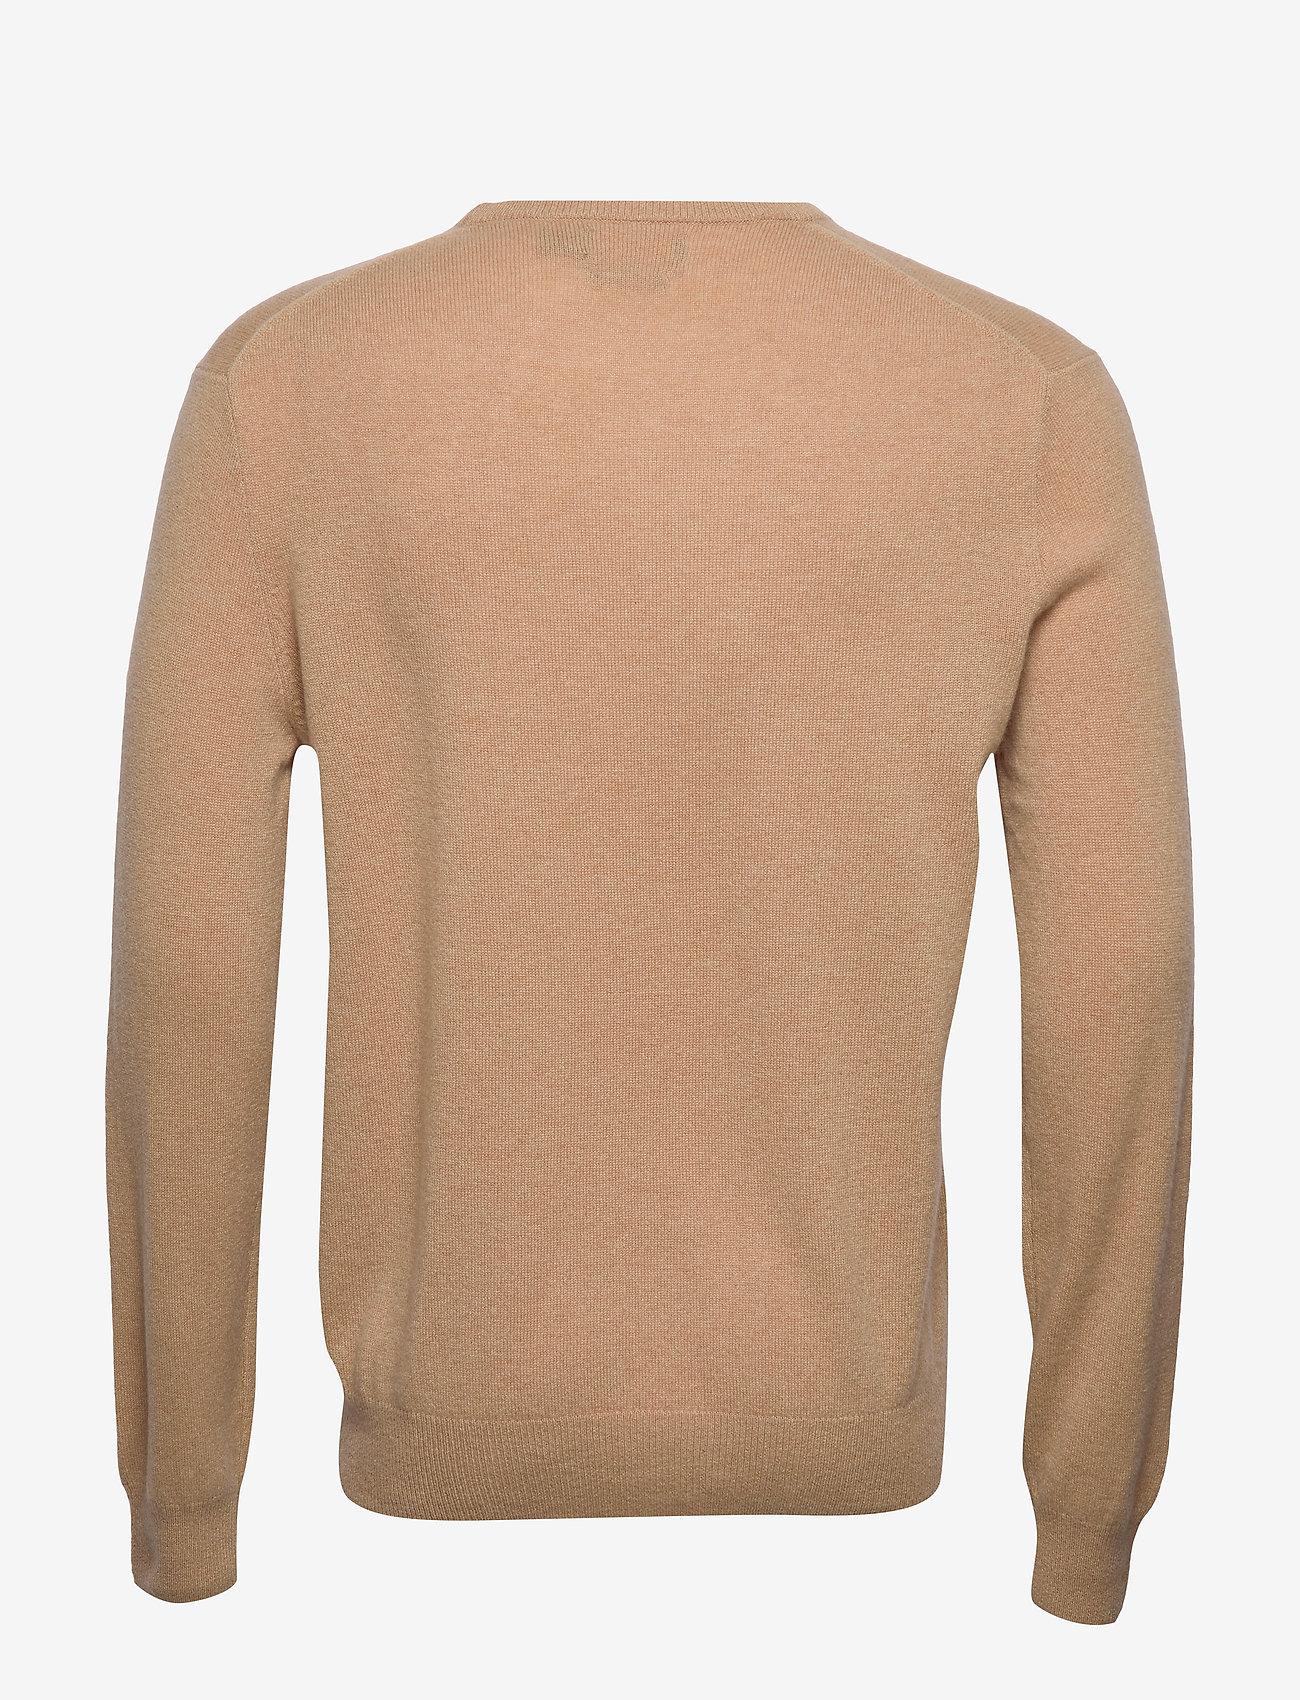 Polo Ralph Lauren Washable Cashmere Sweater - Knitwear